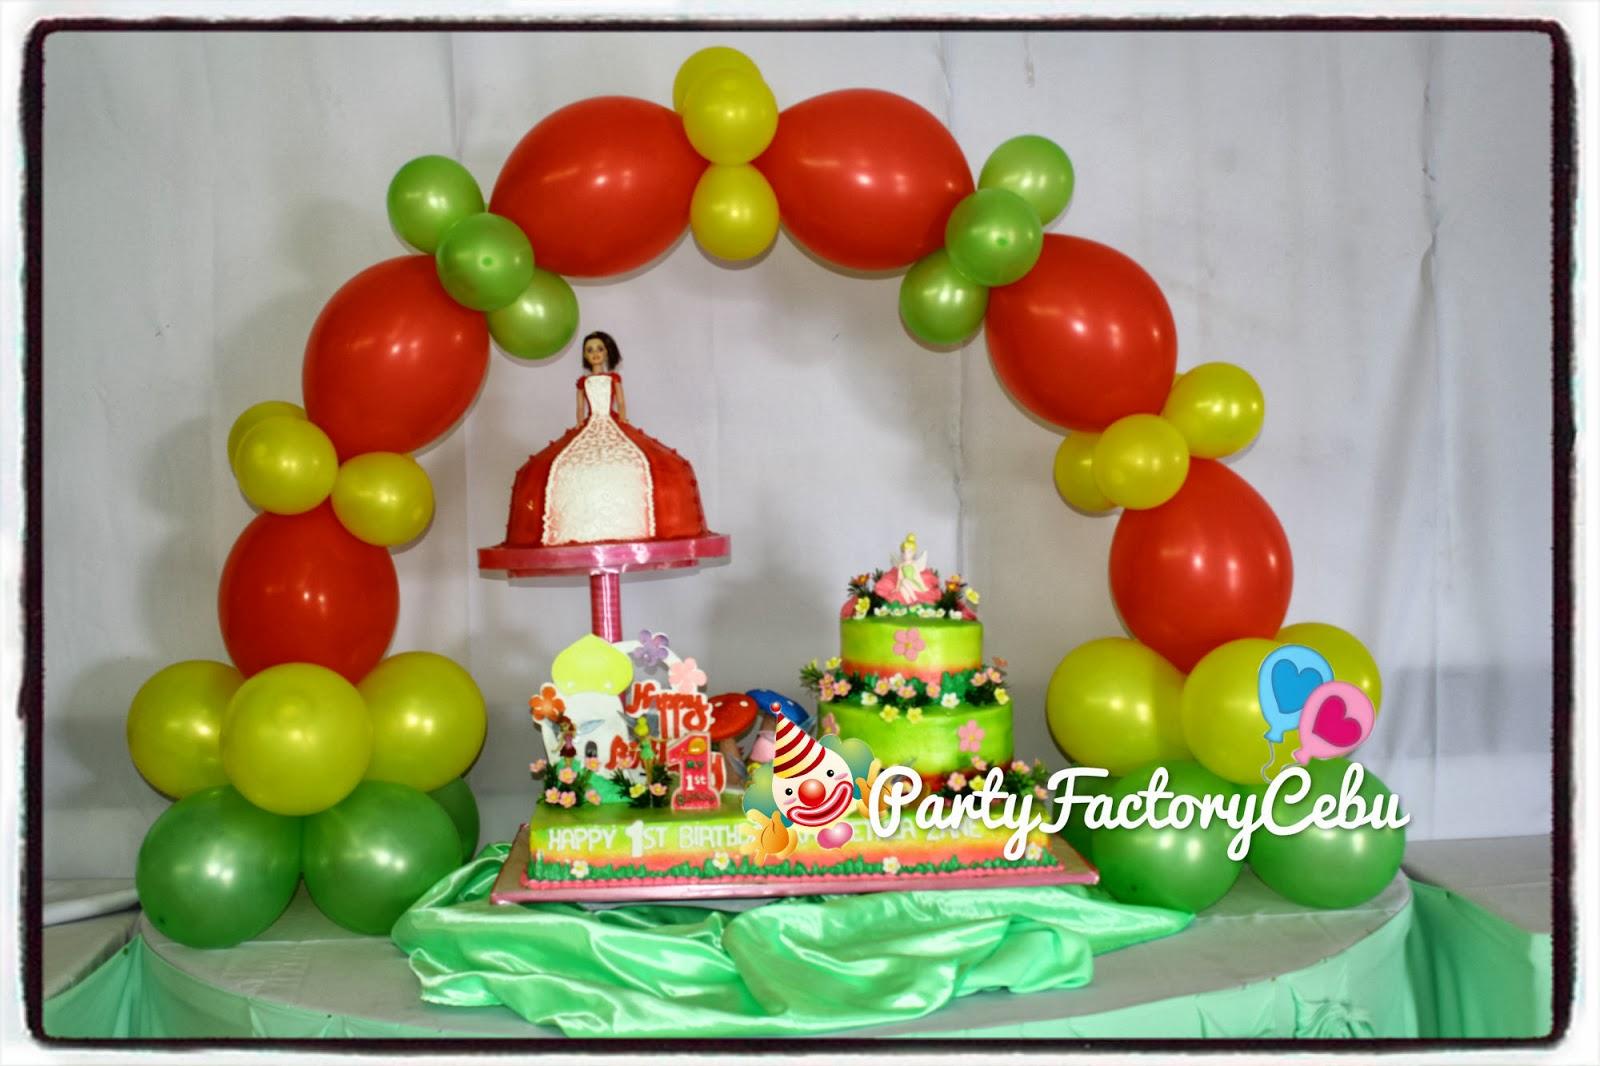 Welcome to PartyFactory Cebu: KASHIETHEA ZANE'S 1st TINKER BELL